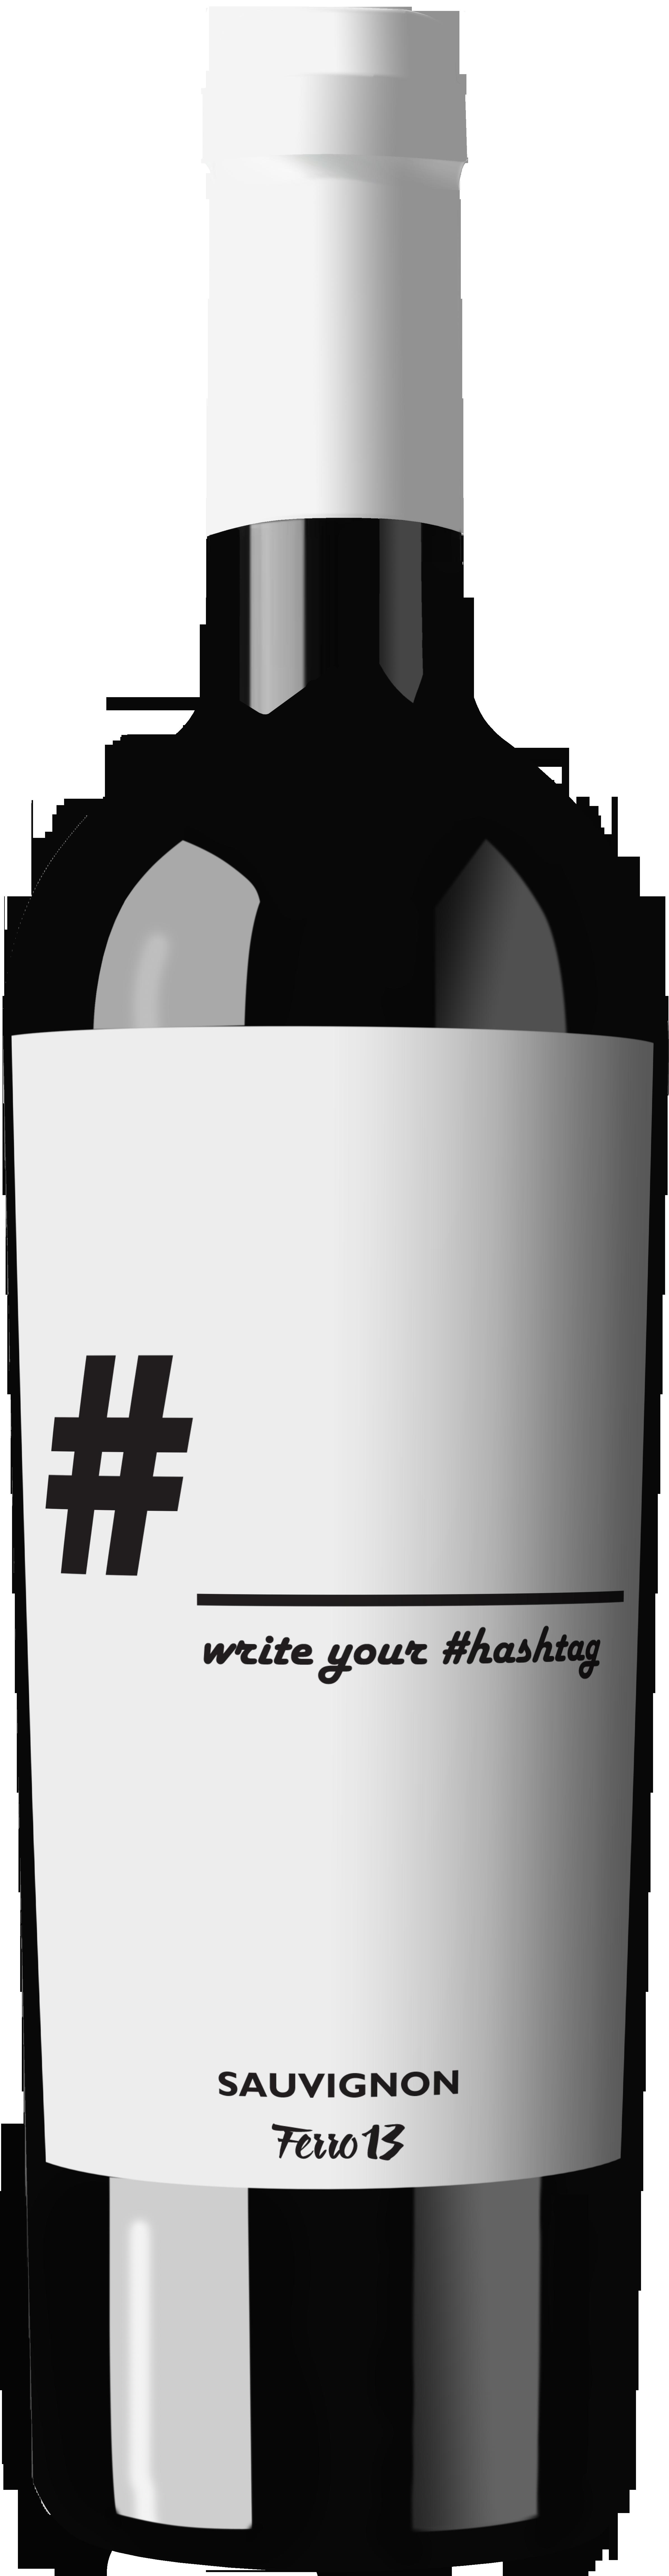 Hashtag - Sauvignon Blanc